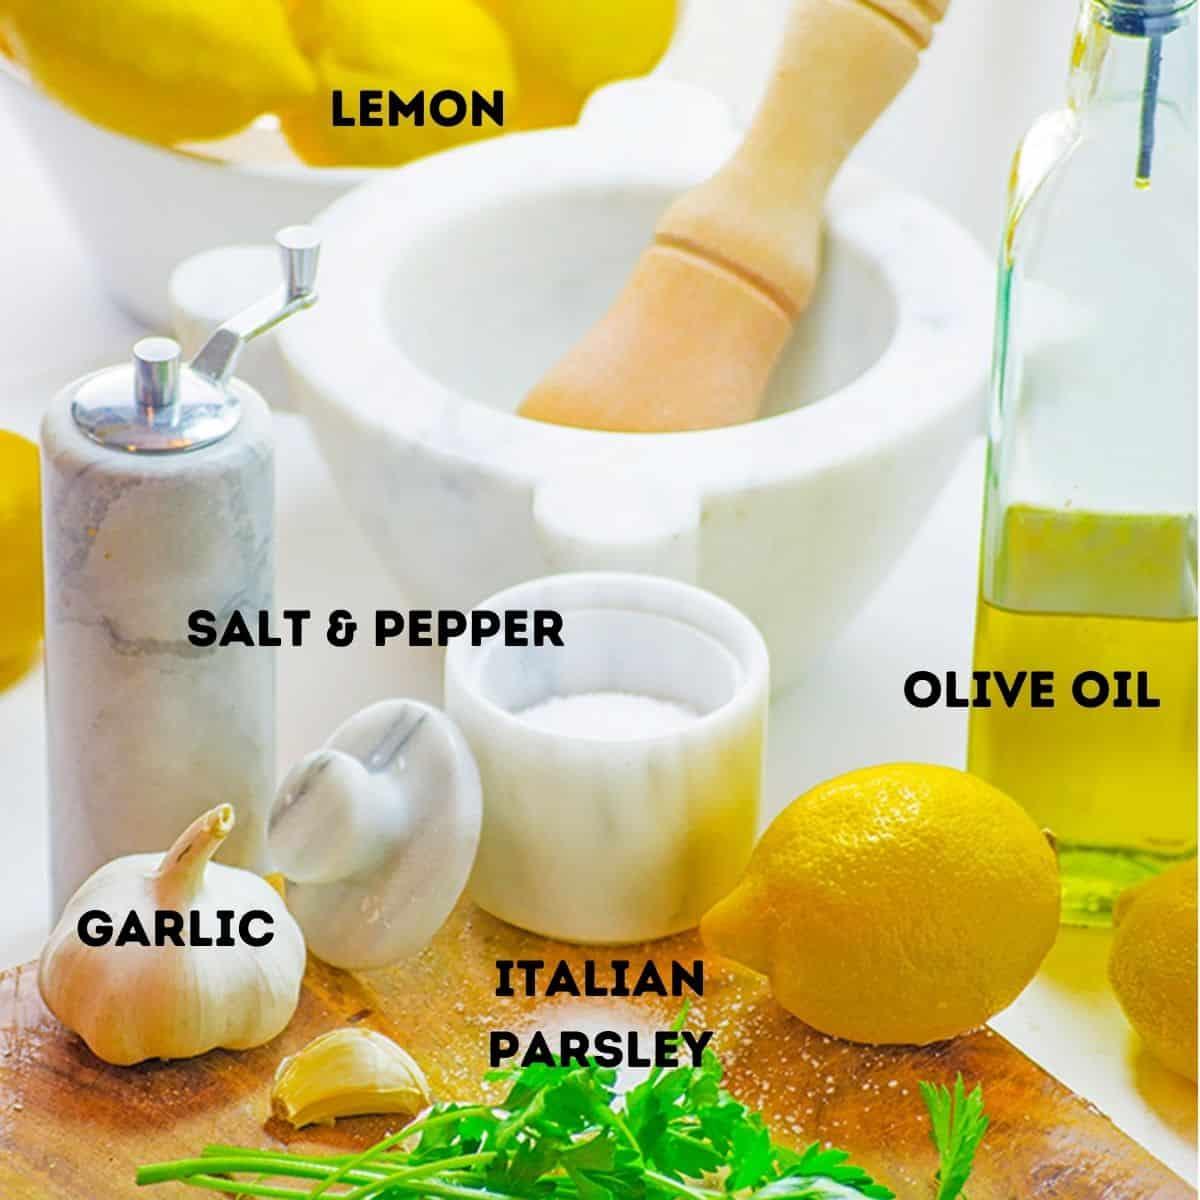 Lemon, olive oil, garlic, and other ingredients to marinate shrimp.